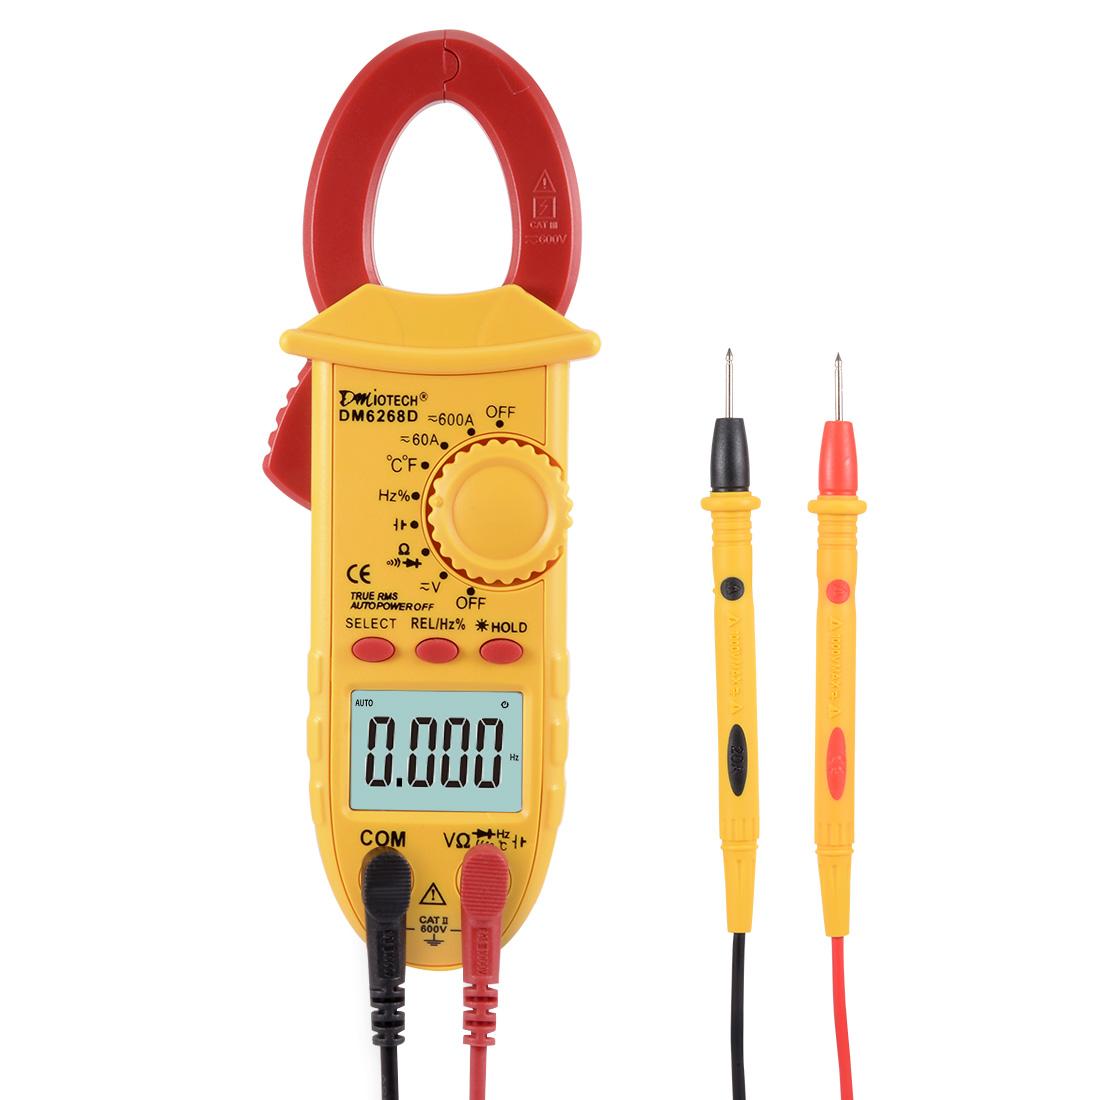 Mini Digital Multimeter AC DC Ammeter Voltage ACV DCV Capacitance Clamp Meter Handheld